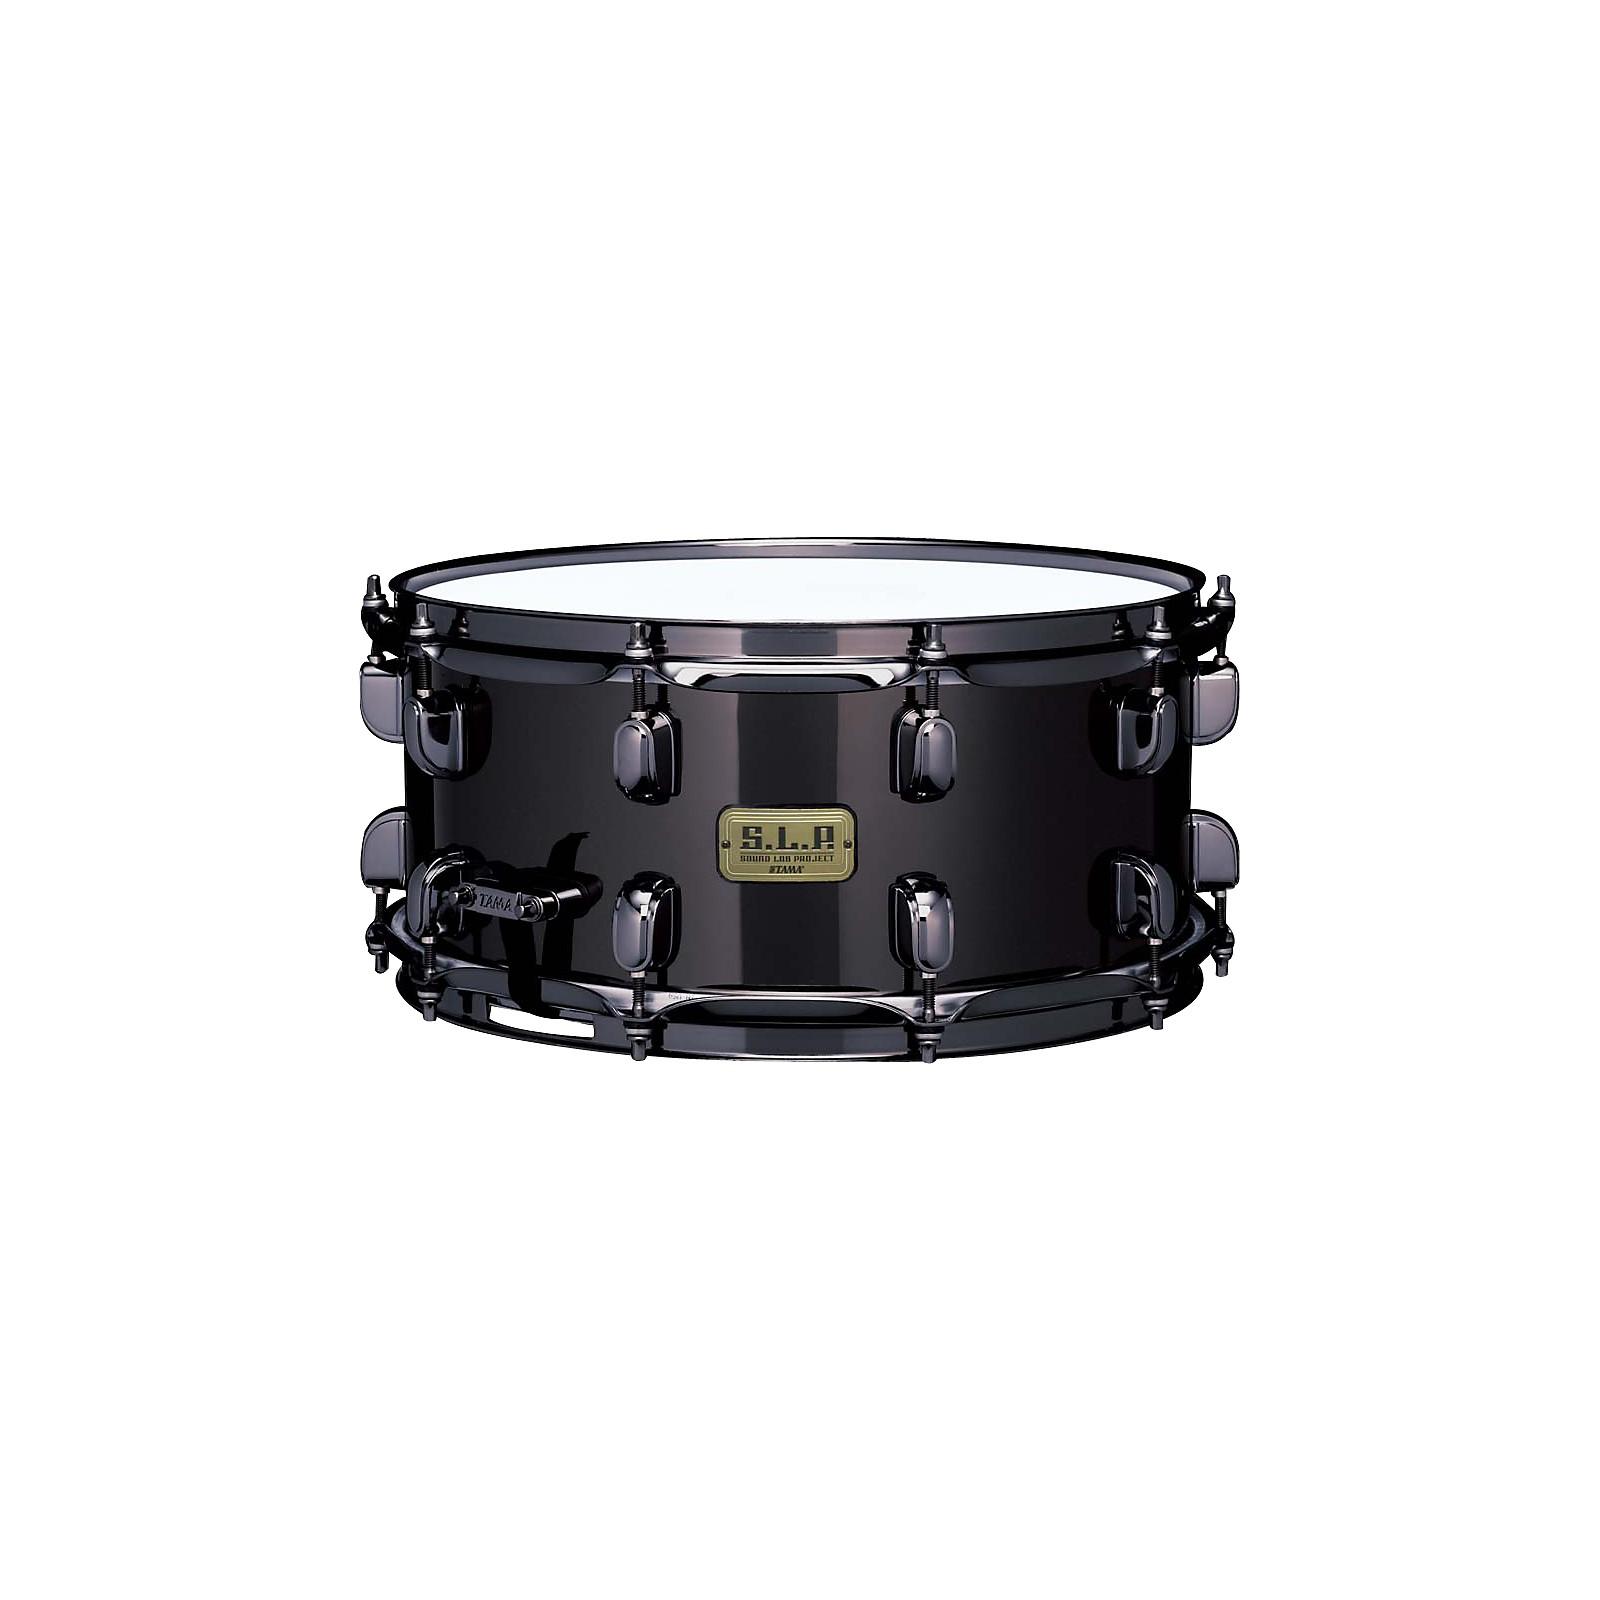 TAMA S.L.P. Black Brass Snare Drum